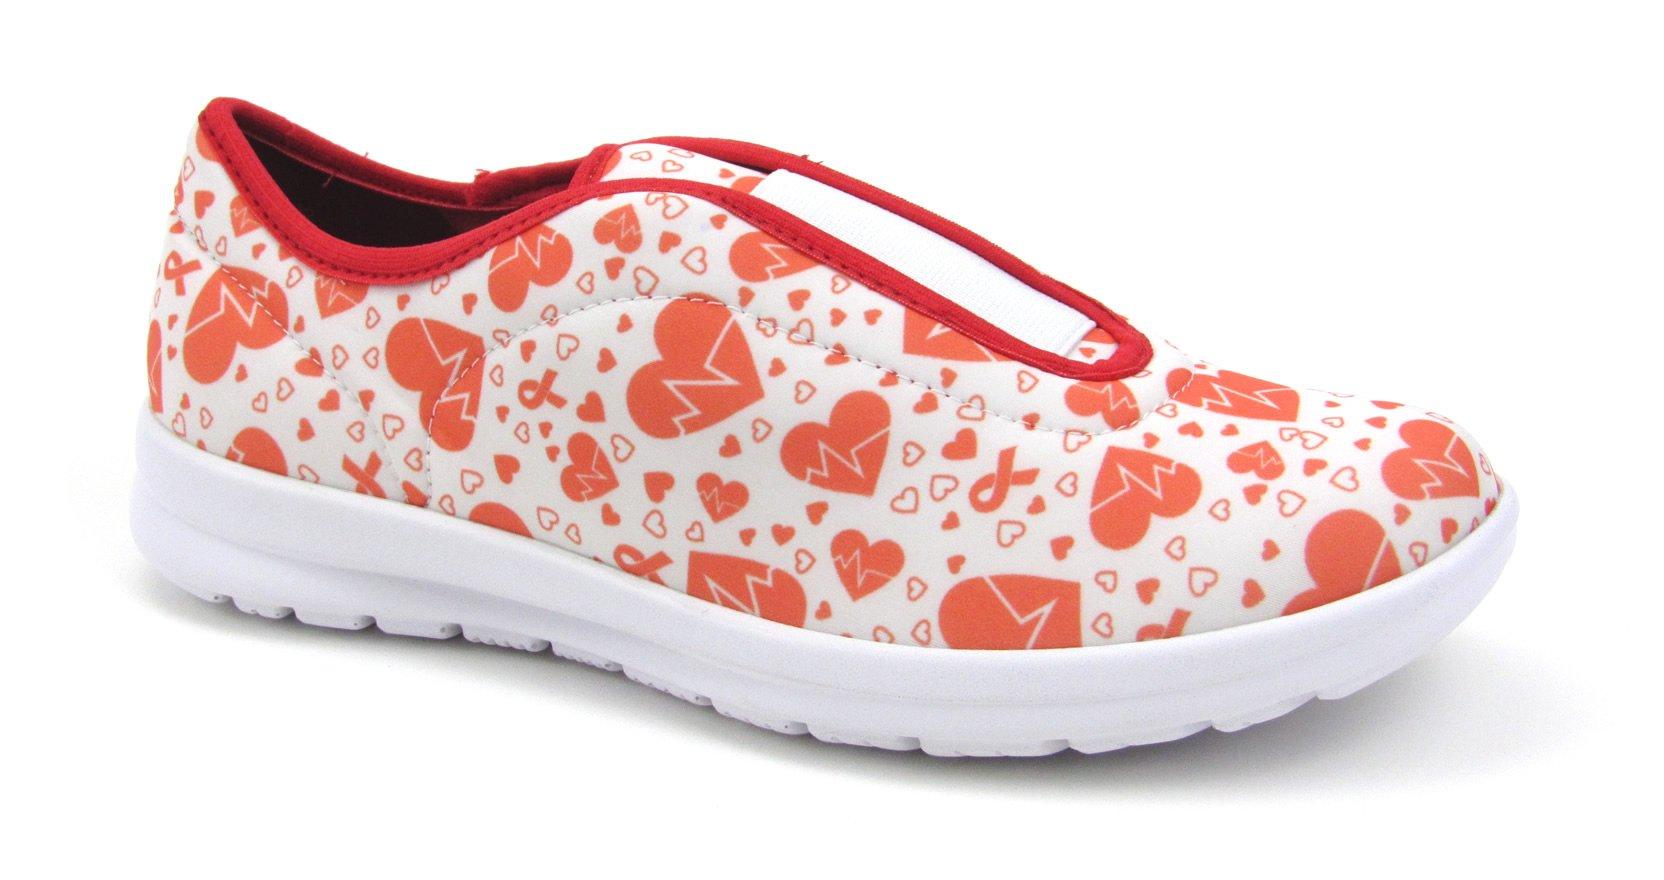 Move Women's Cute Memory Foam Elastic Gore Nursing Shoes - Printed - Florence (8, Electro Heart)